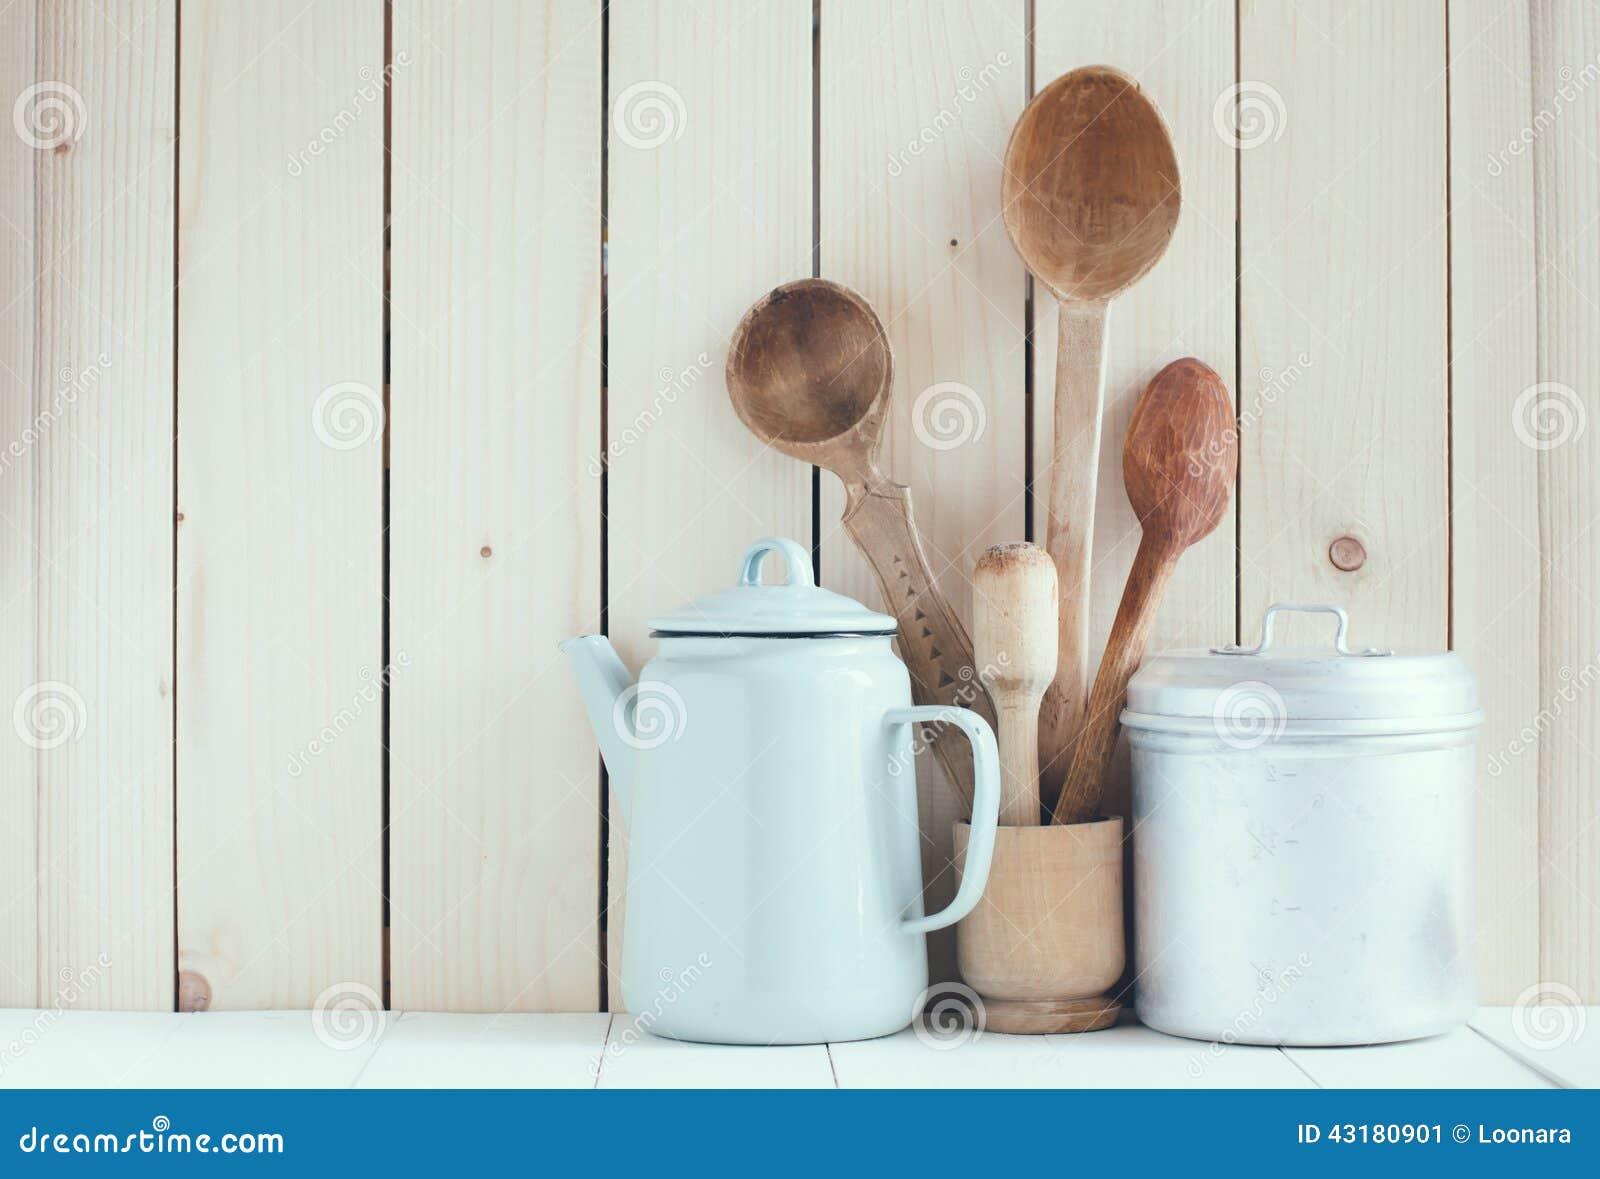 Coffee Pot Enamel Mugs And Rustic Spoons Stock Photo